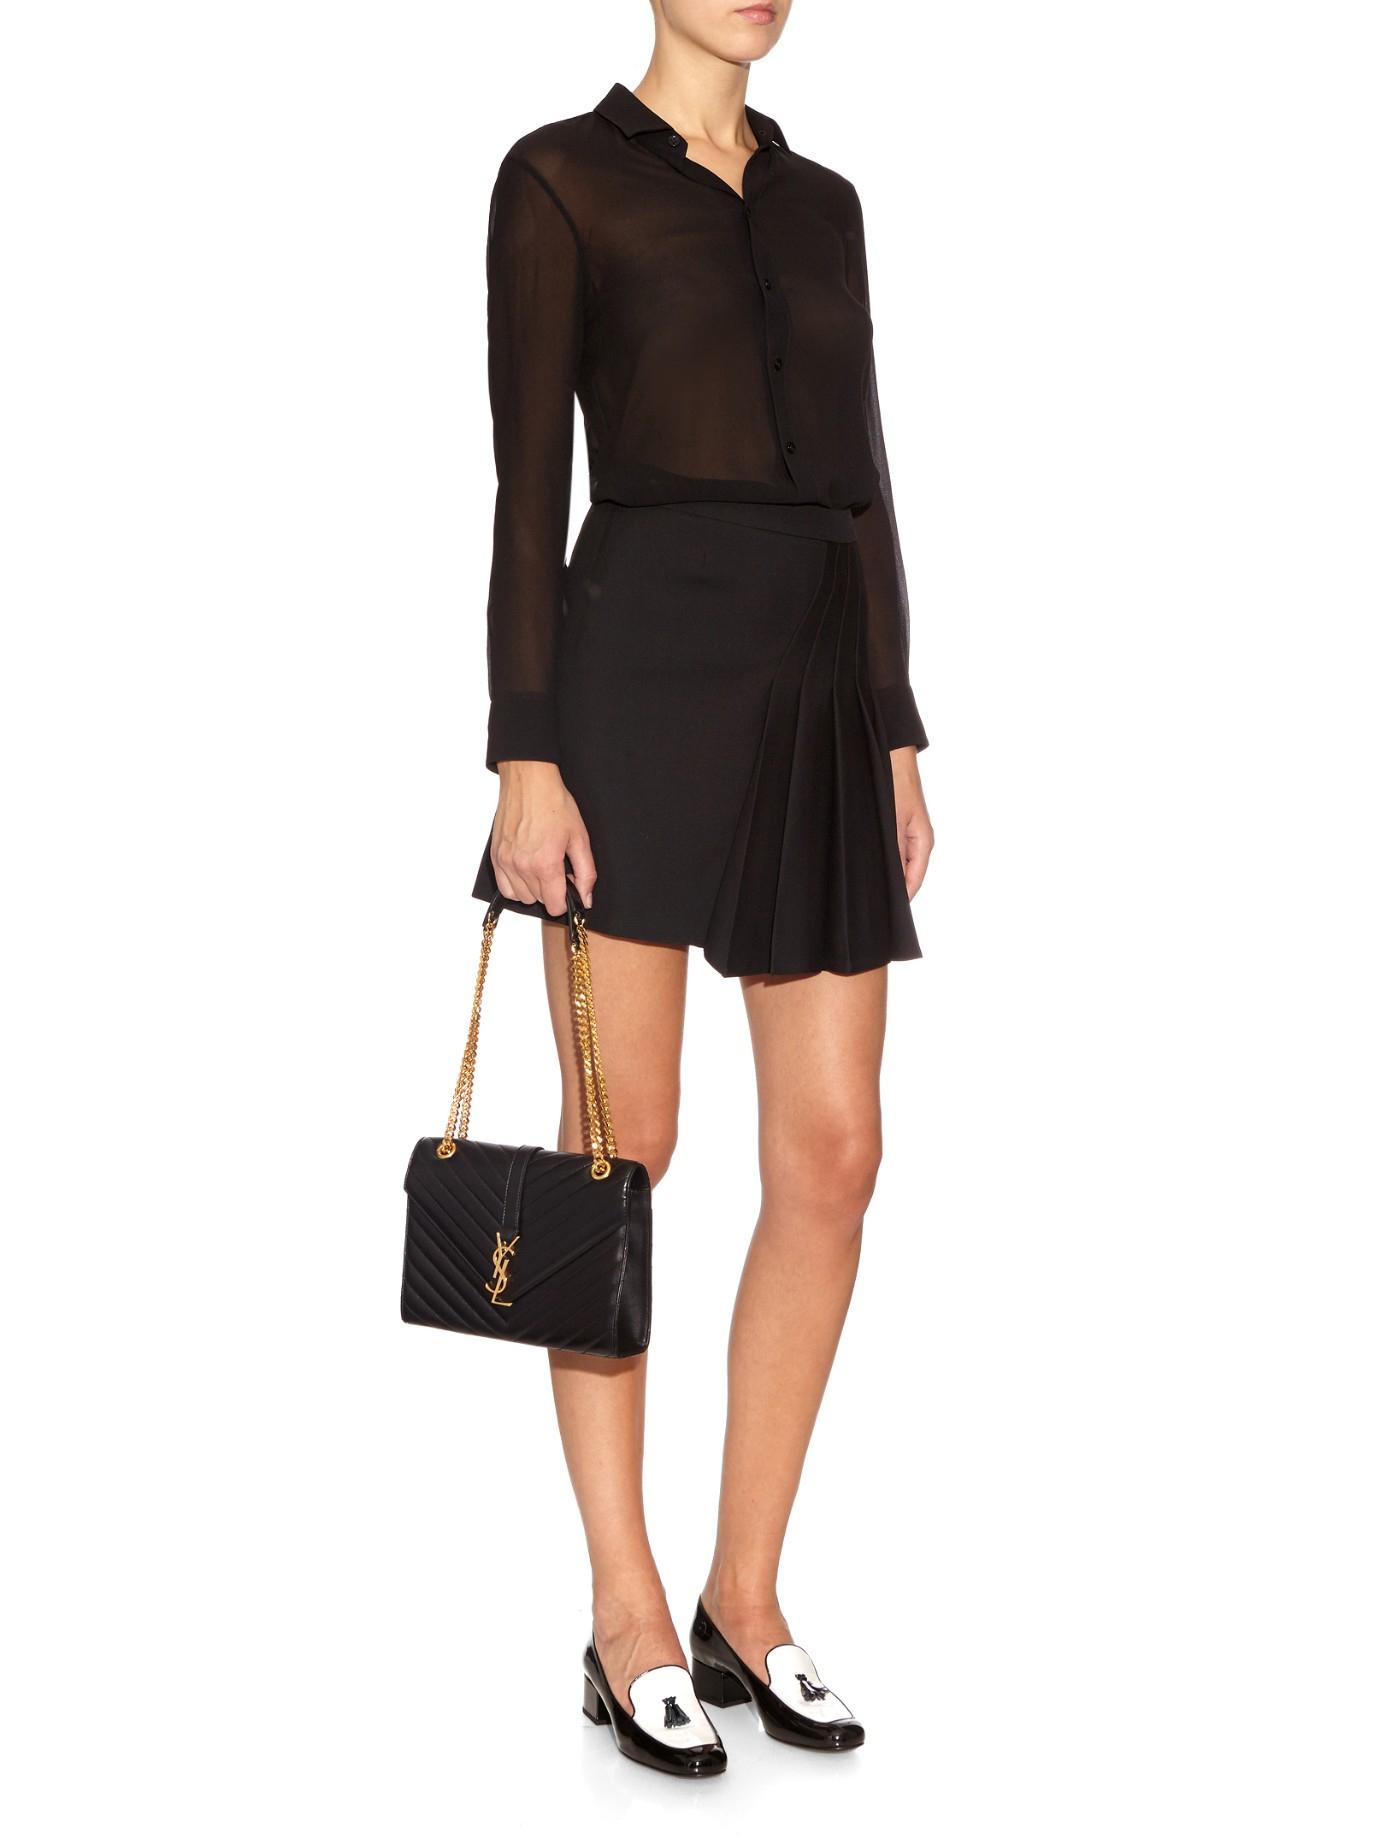 674db4d36f2b Lyst - Saint Laurent Classic Monogram Quilted-Leather Shoulder Bag in Black